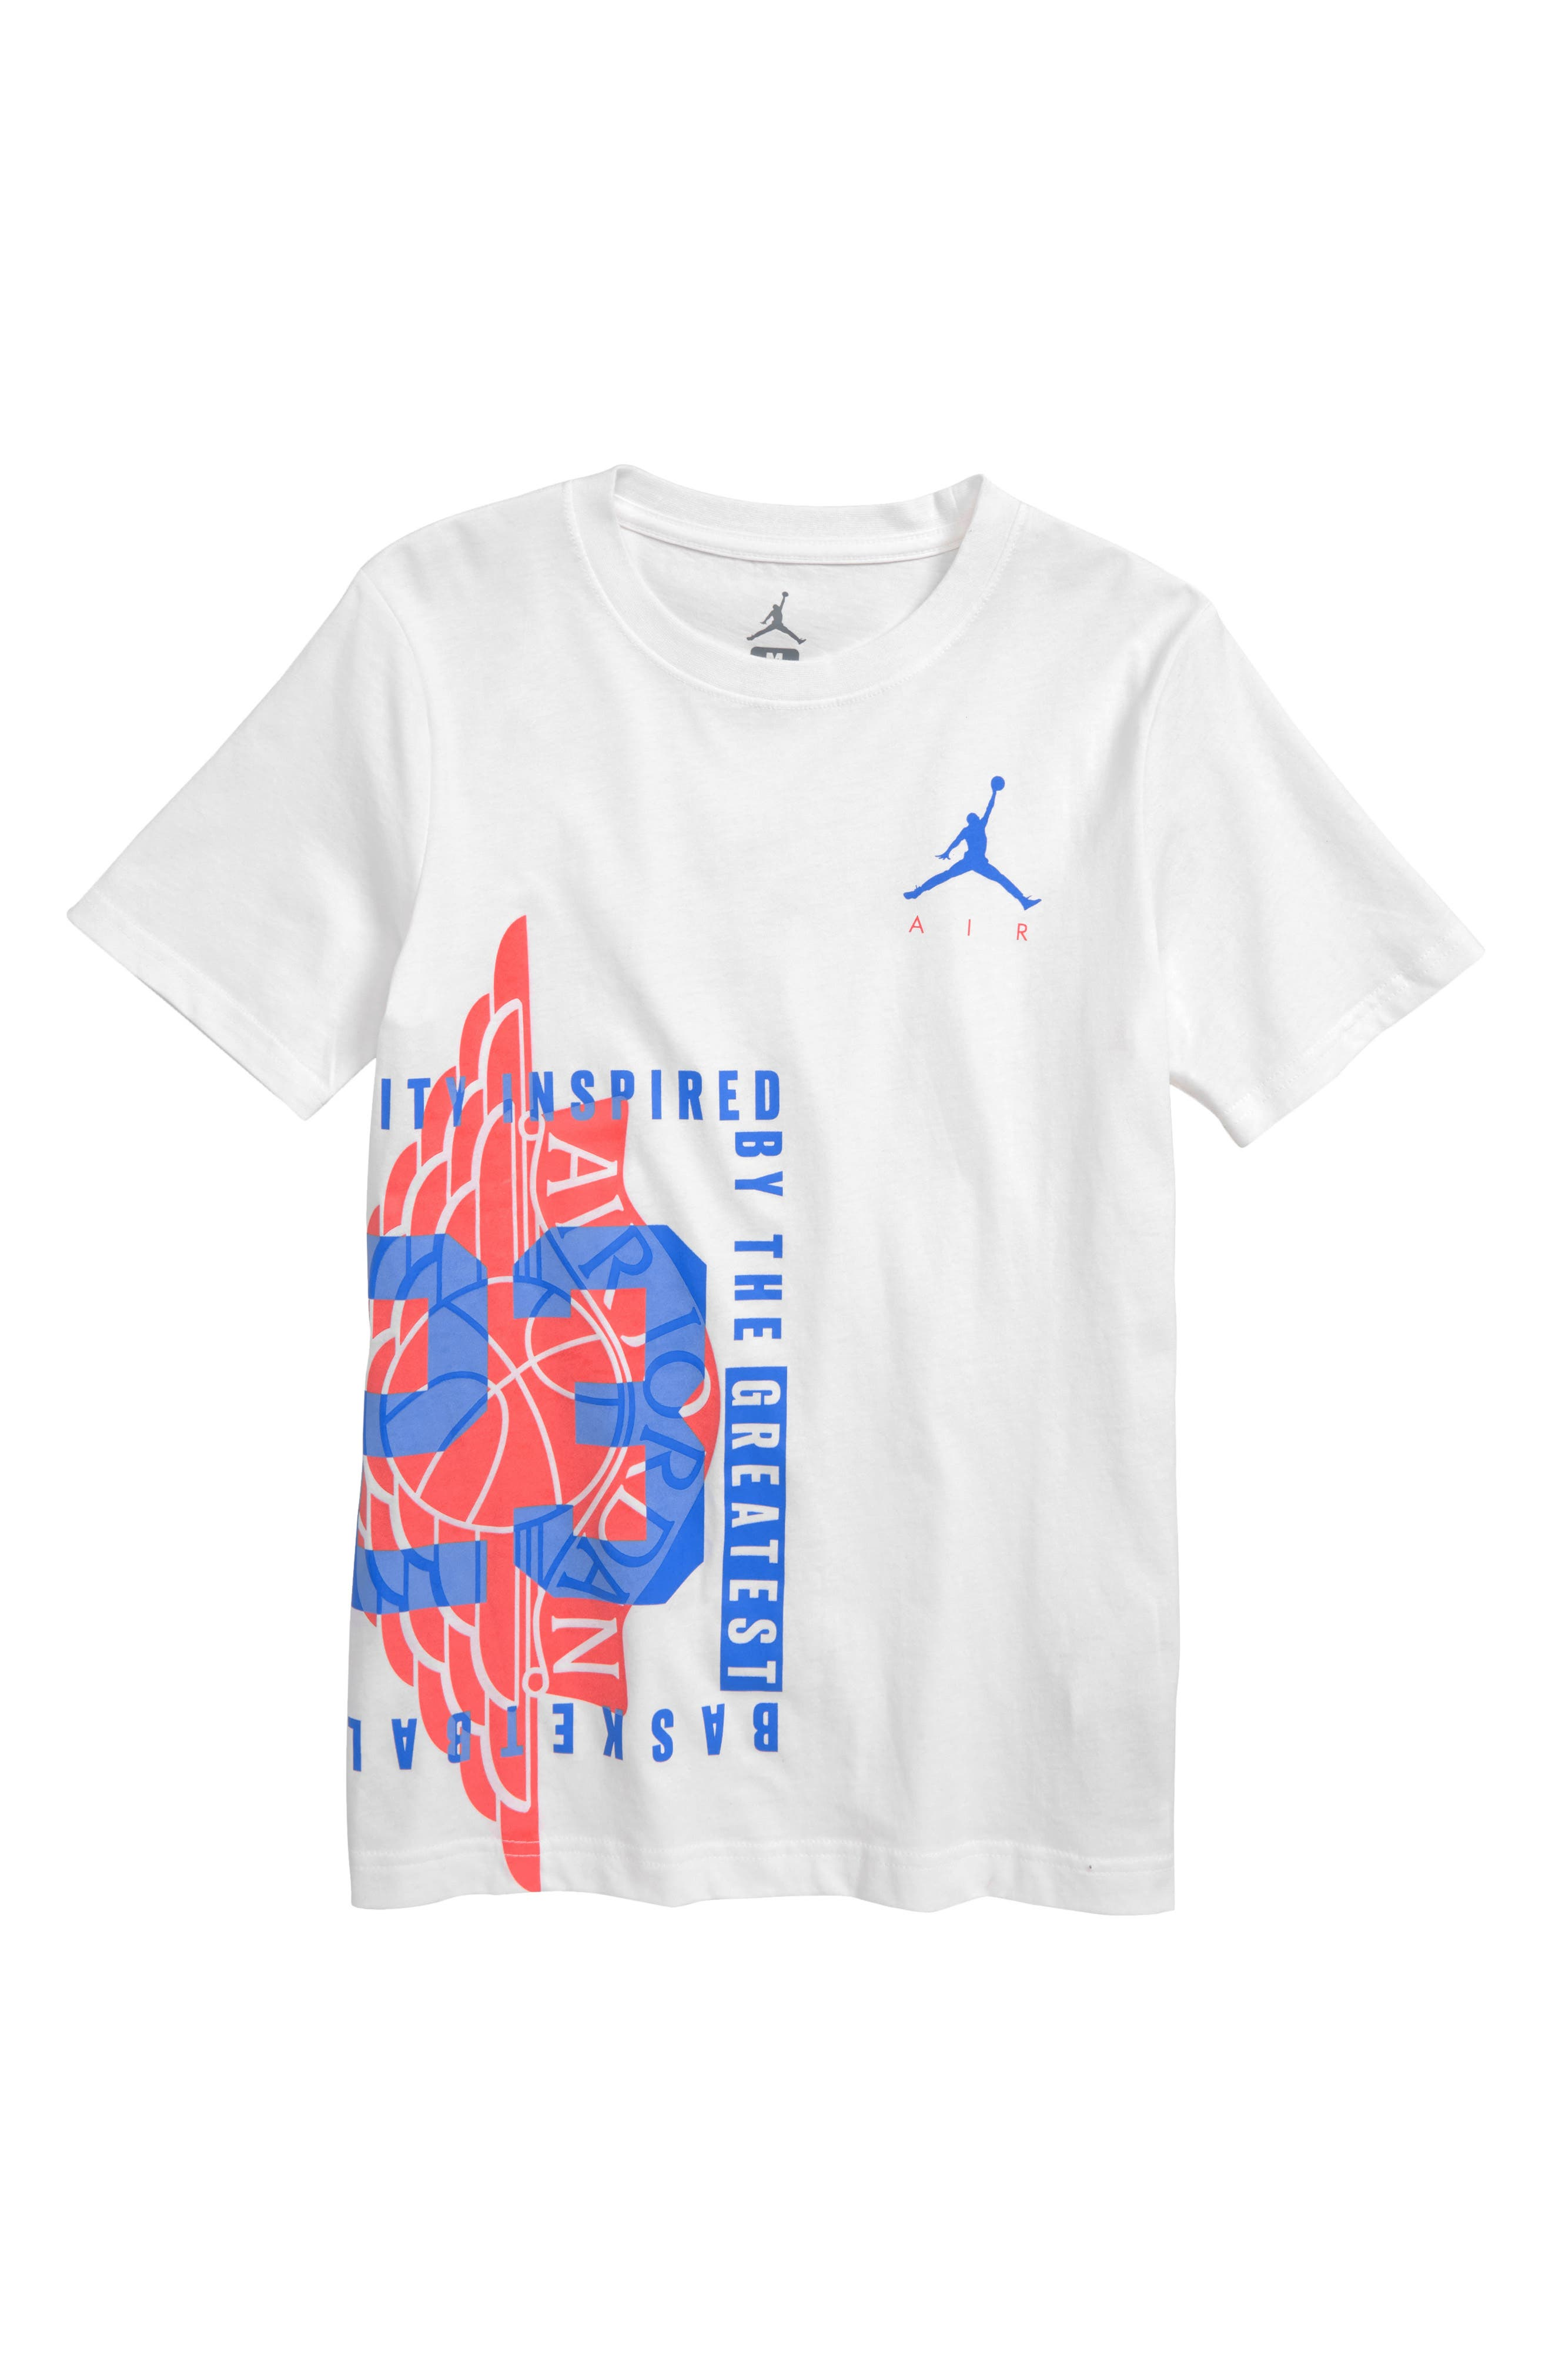 fefcc3b8b9deca Boys  Jordan Clothes (Sizes 2T-7)  T-Shirts